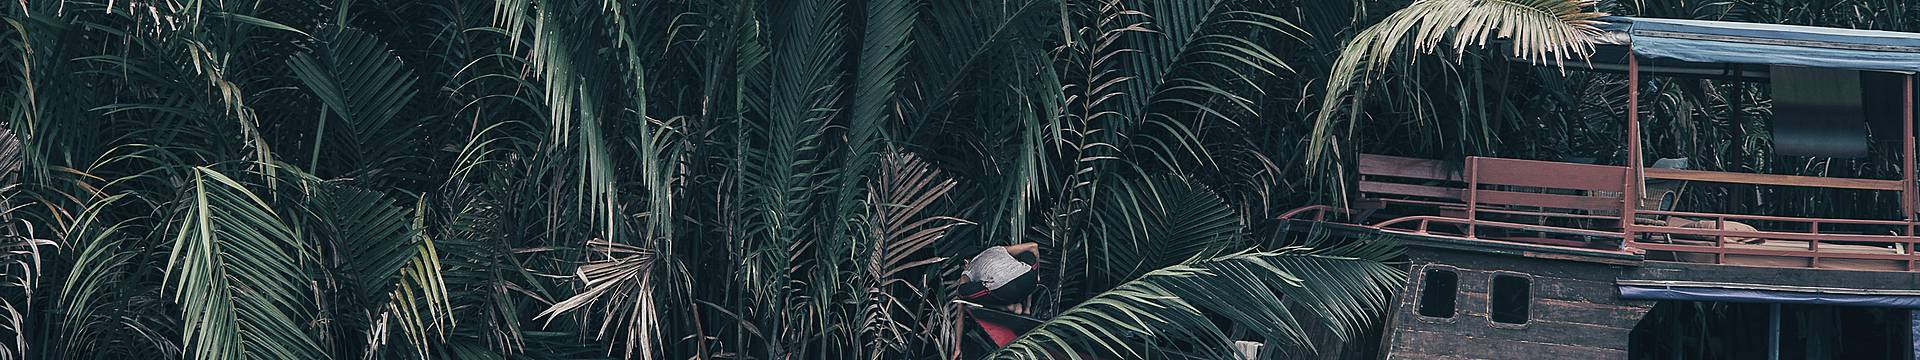 Borneo reizen